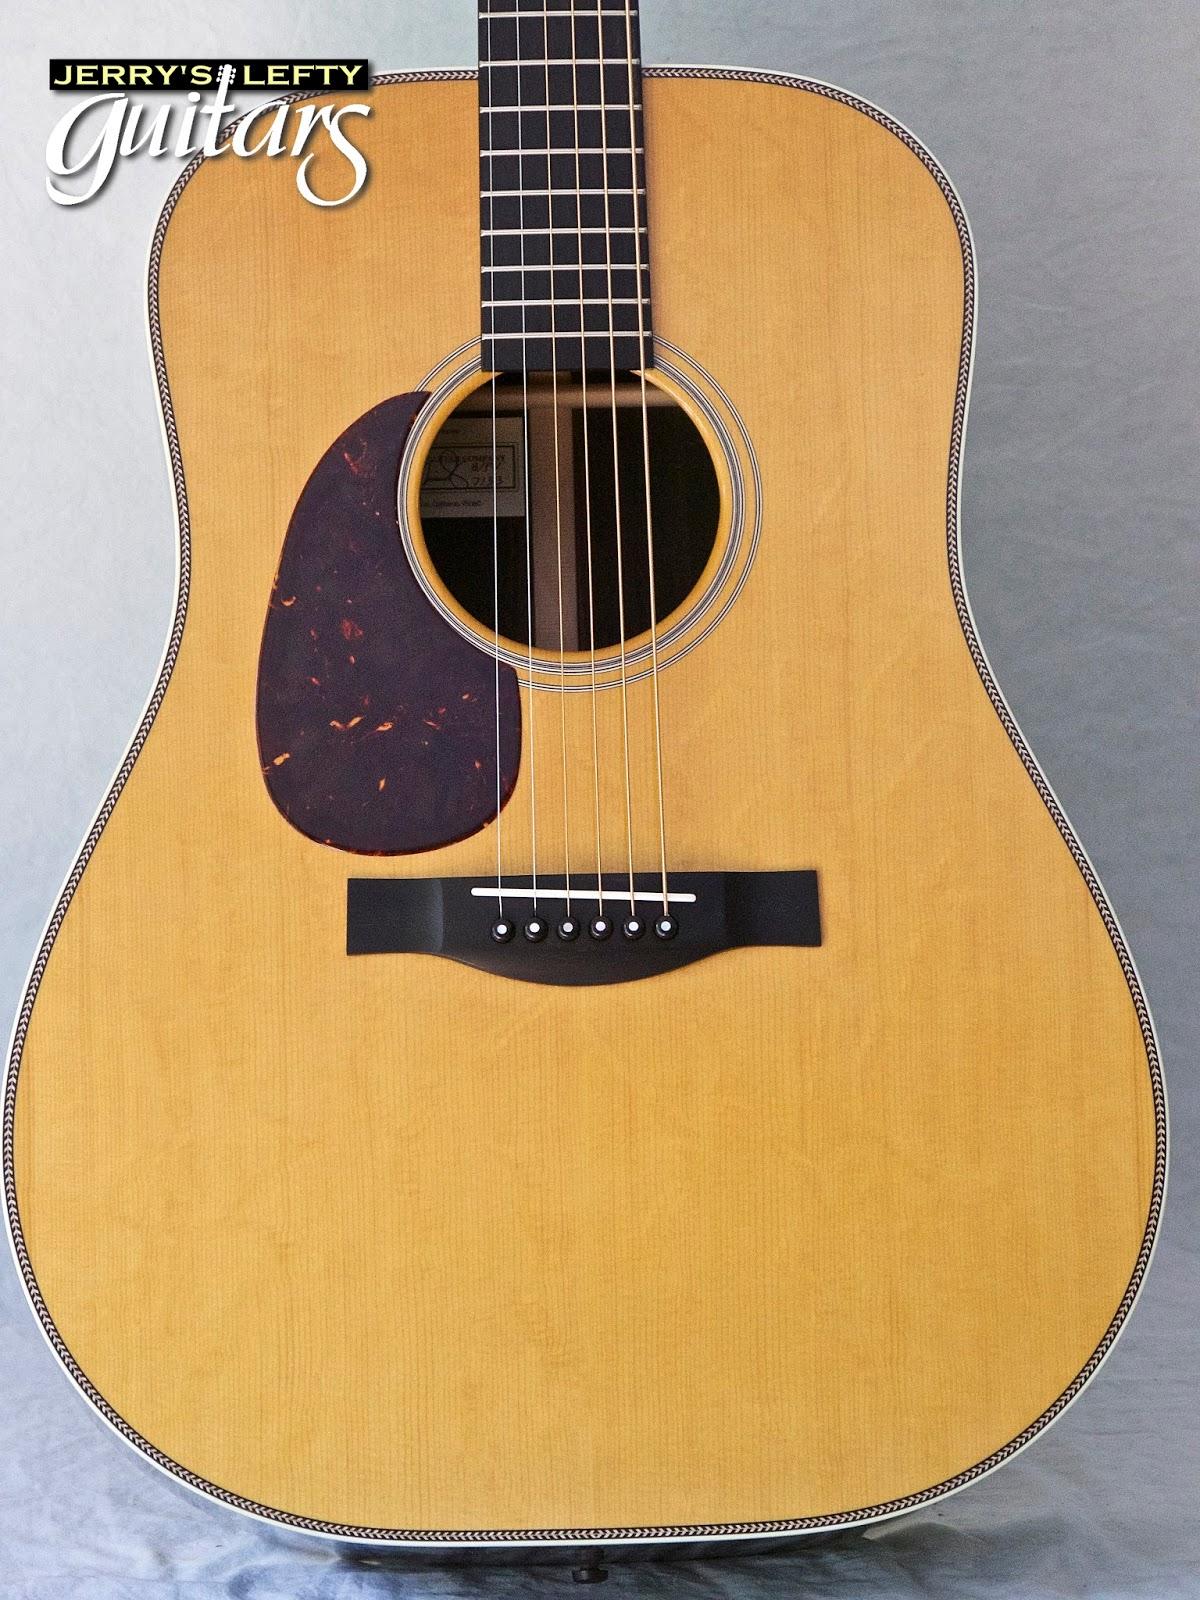 jerry 39 s lefty guitars newest guitar arrivals updated weekly santa cruz brad paisley signature. Black Bedroom Furniture Sets. Home Design Ideas